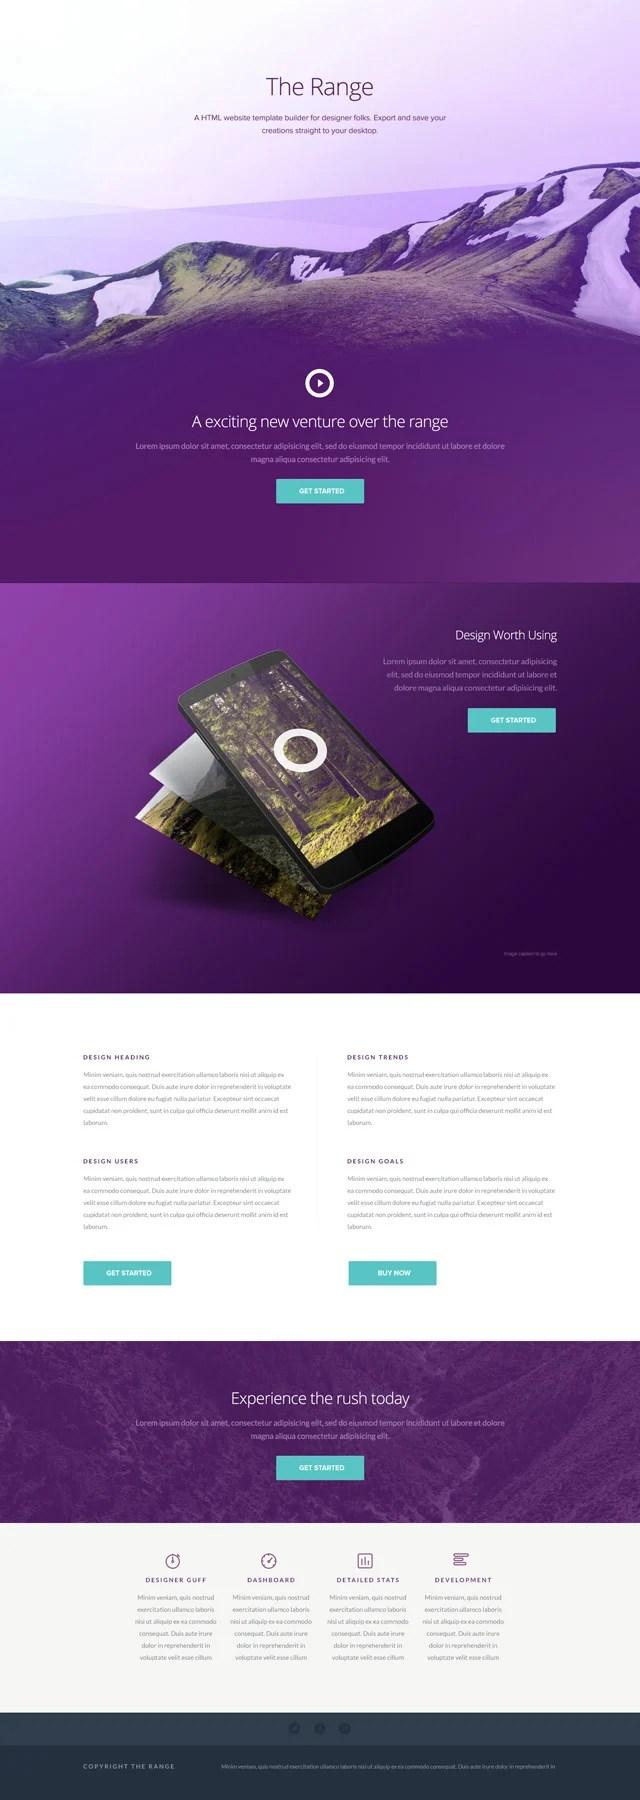 Best Free Single Page Website Templates PSD - Pixel2Pixel Design